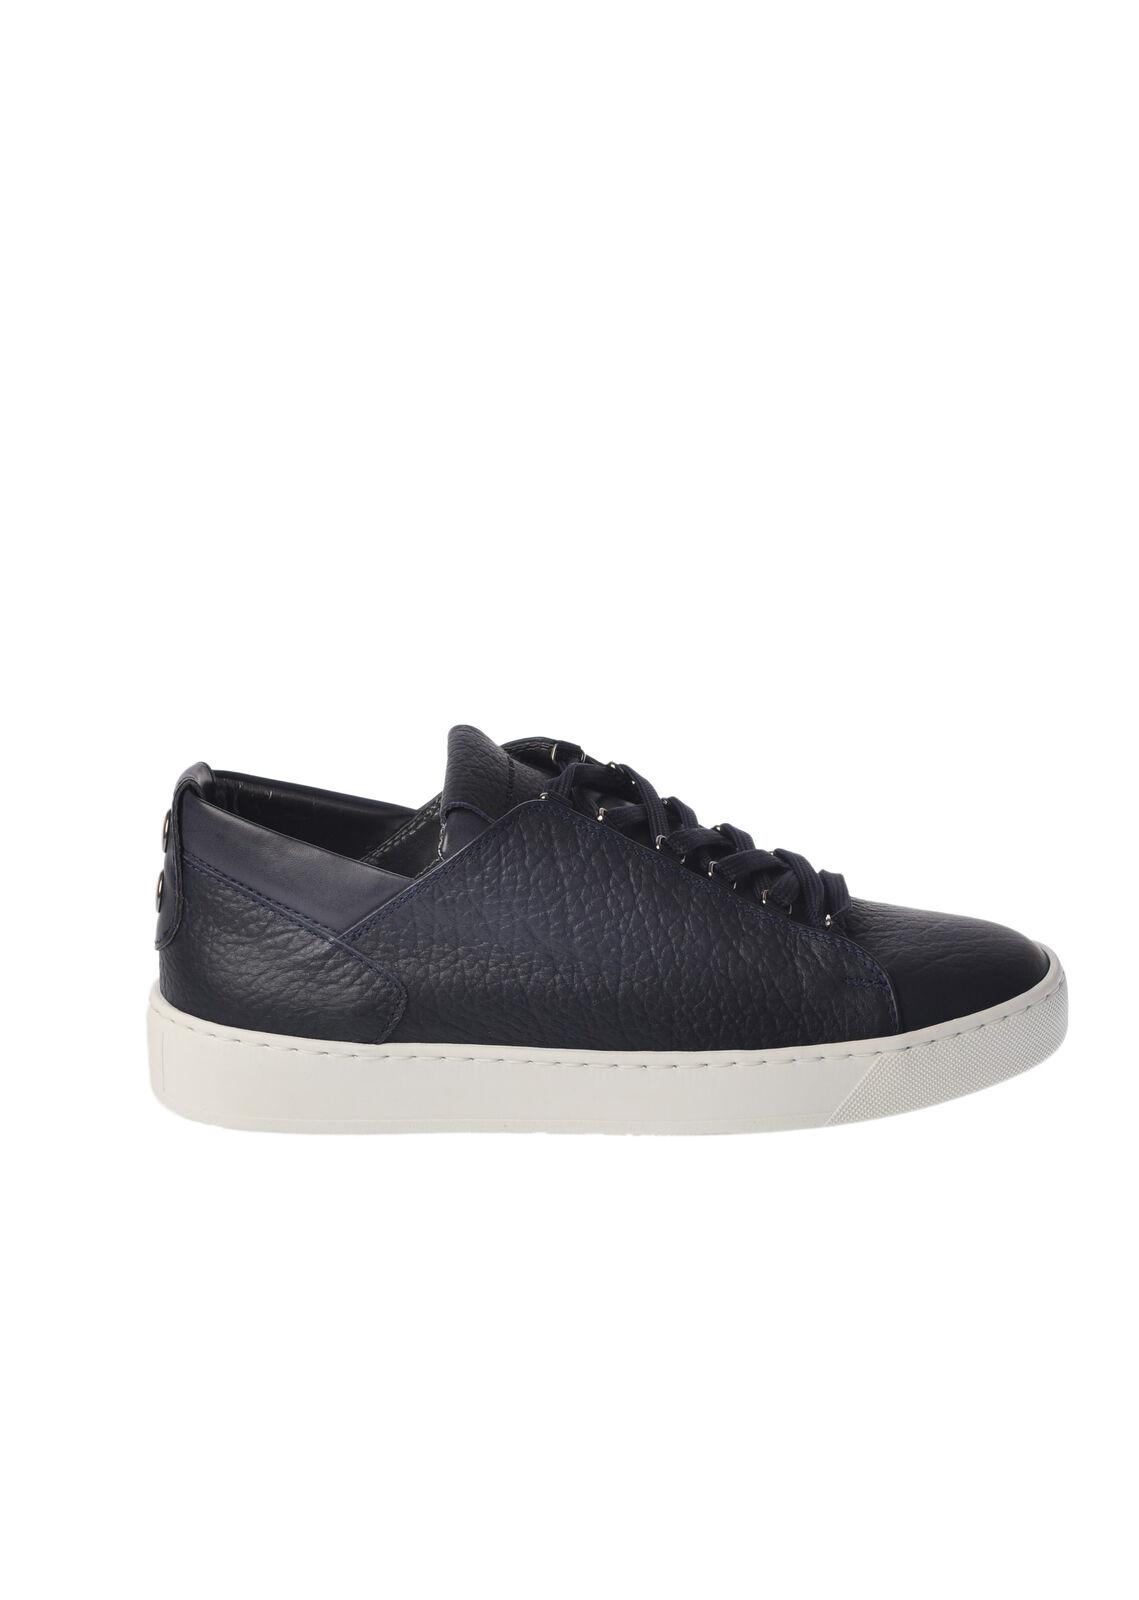 Alexander Smith - scarpe-scarpe da ginnastica low - Man - blu - 4992215G180704